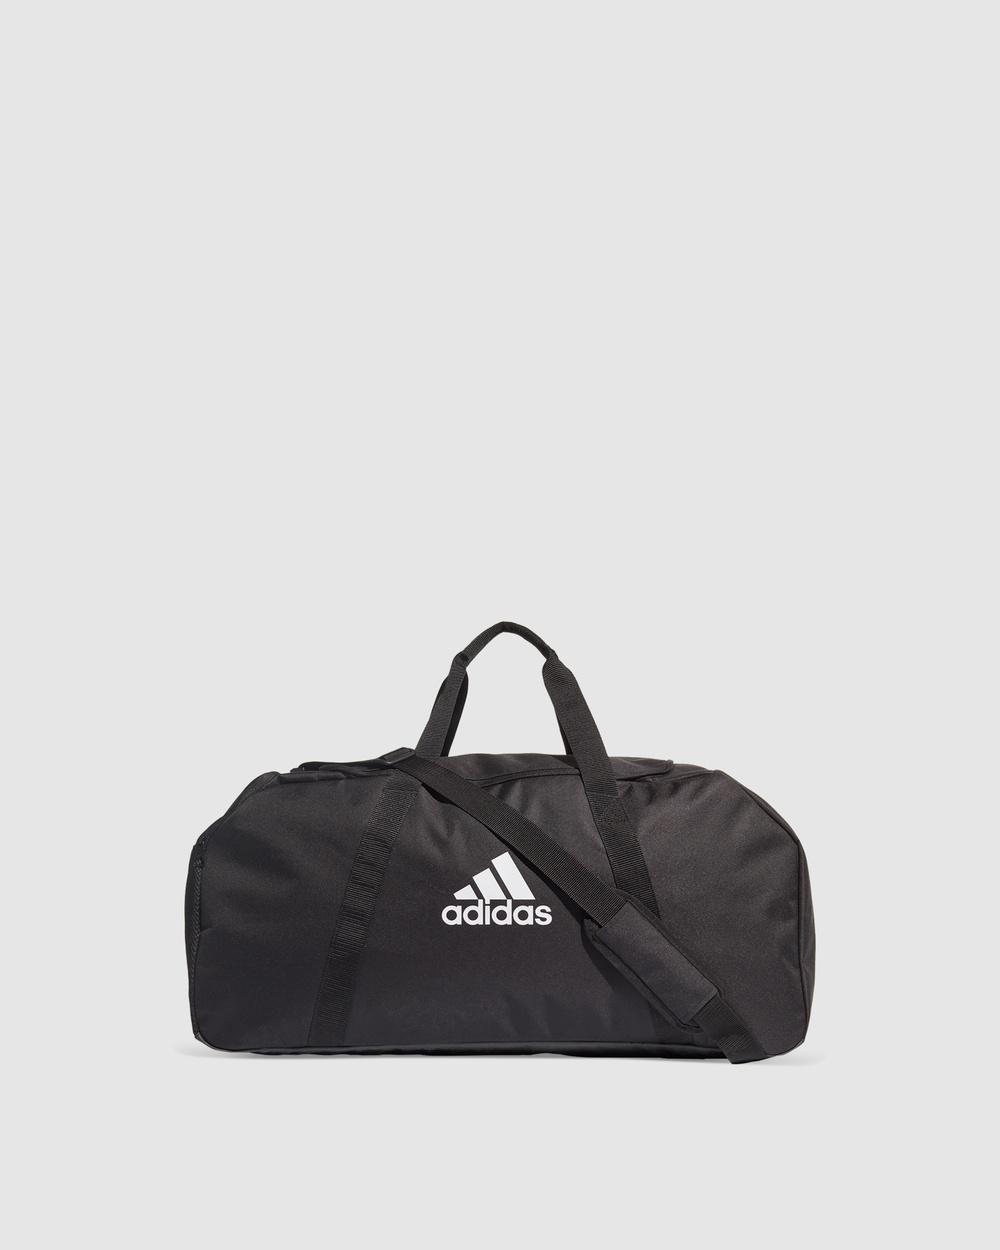 adidas Performance Tiro Primegreen Duffel Bag Large Bags Black